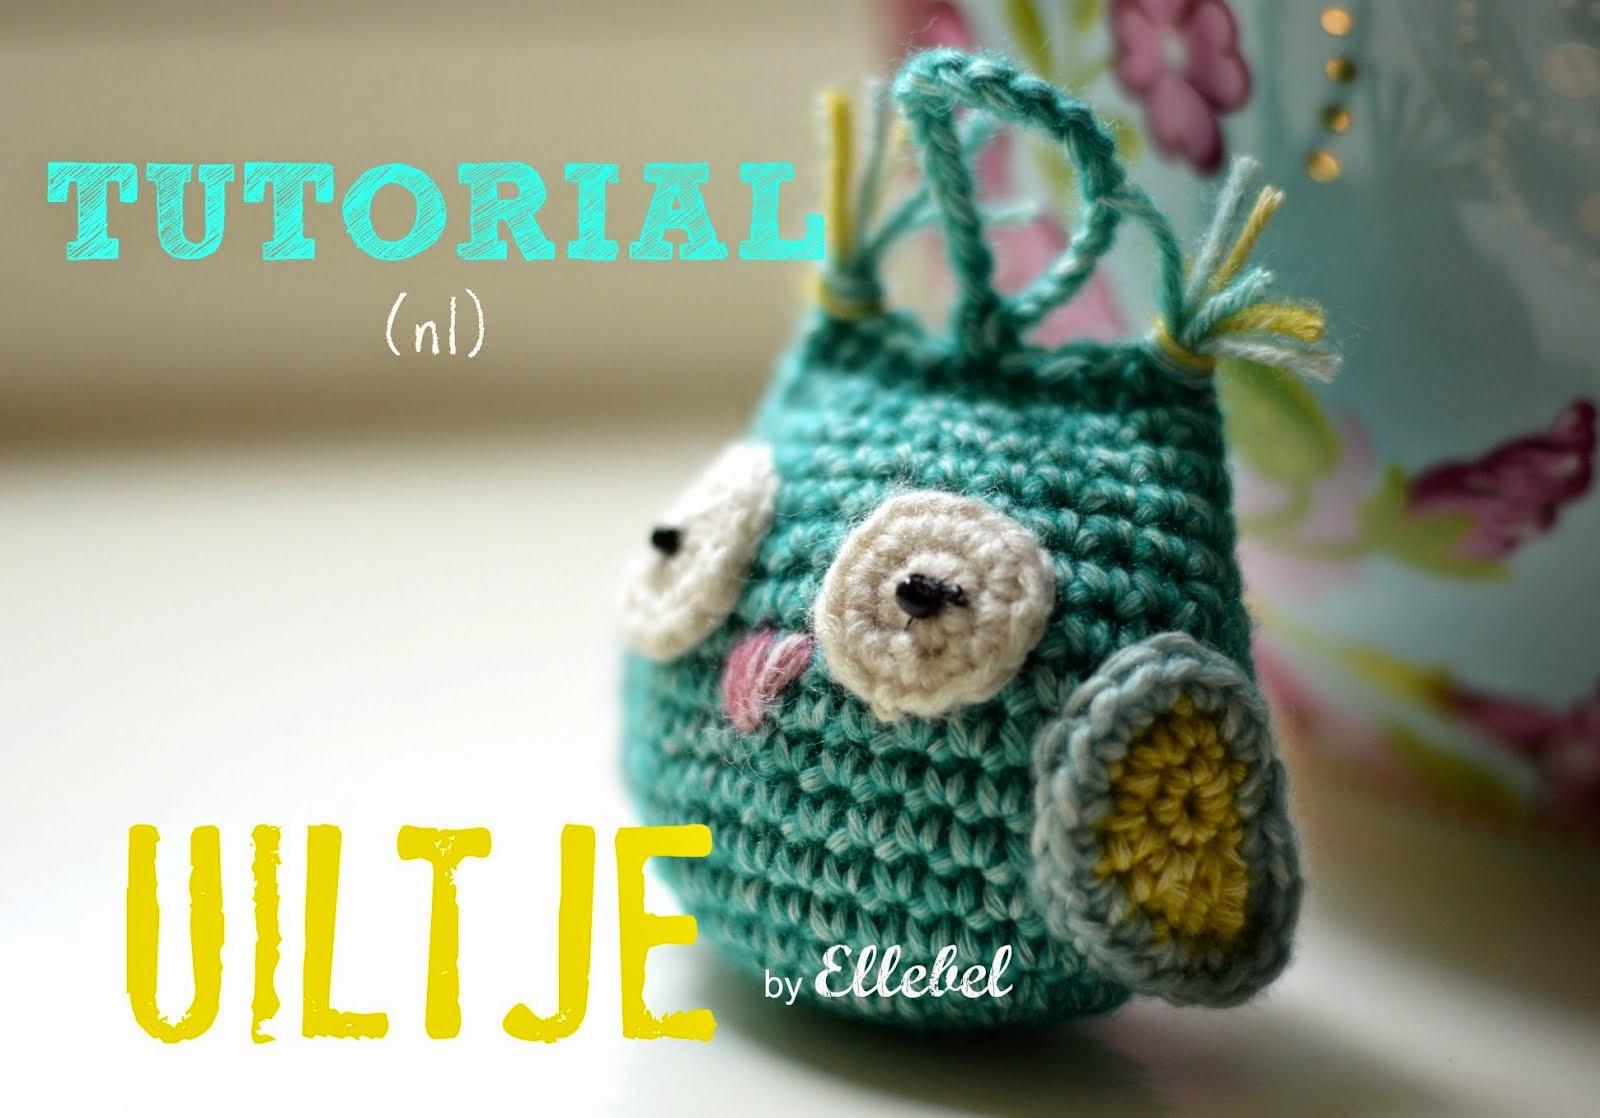 Tutorial (NL) uiltje